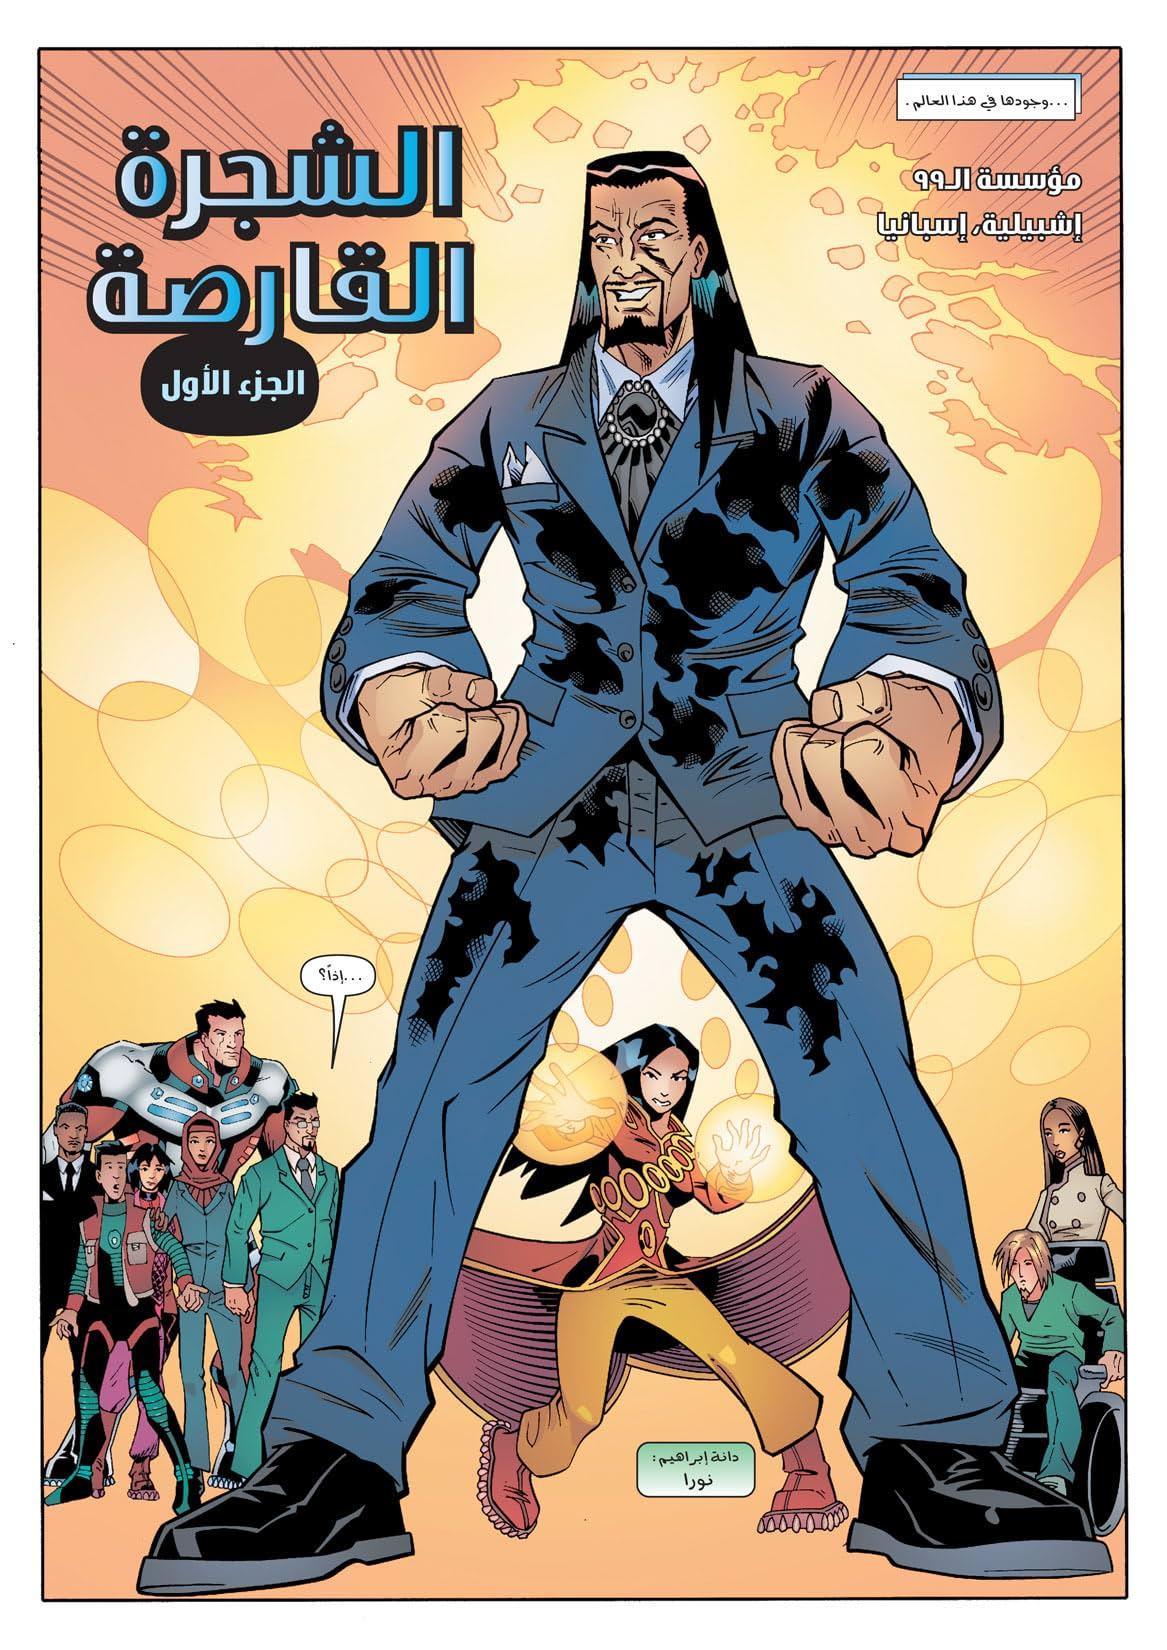 THE 99 #28: Arabic